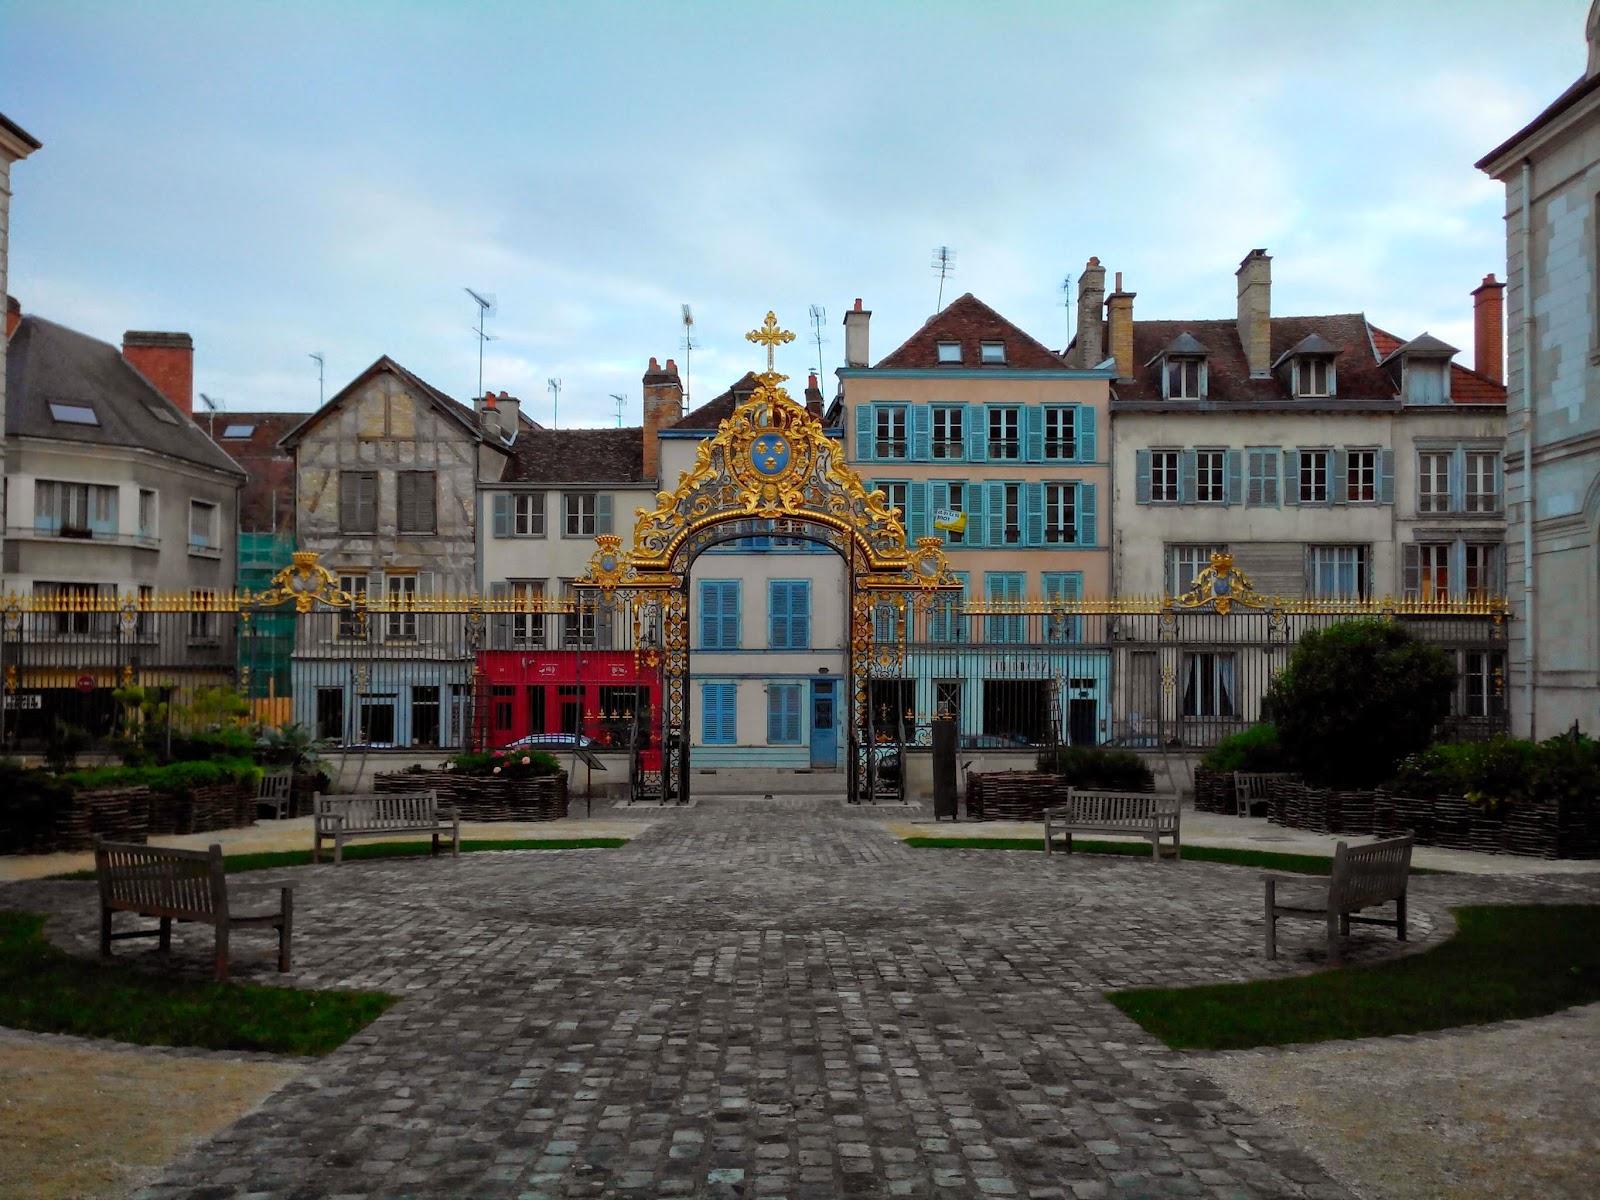 Troyes en champagne les bancs de l 39 h tel dieu troyes for Hotels troyes